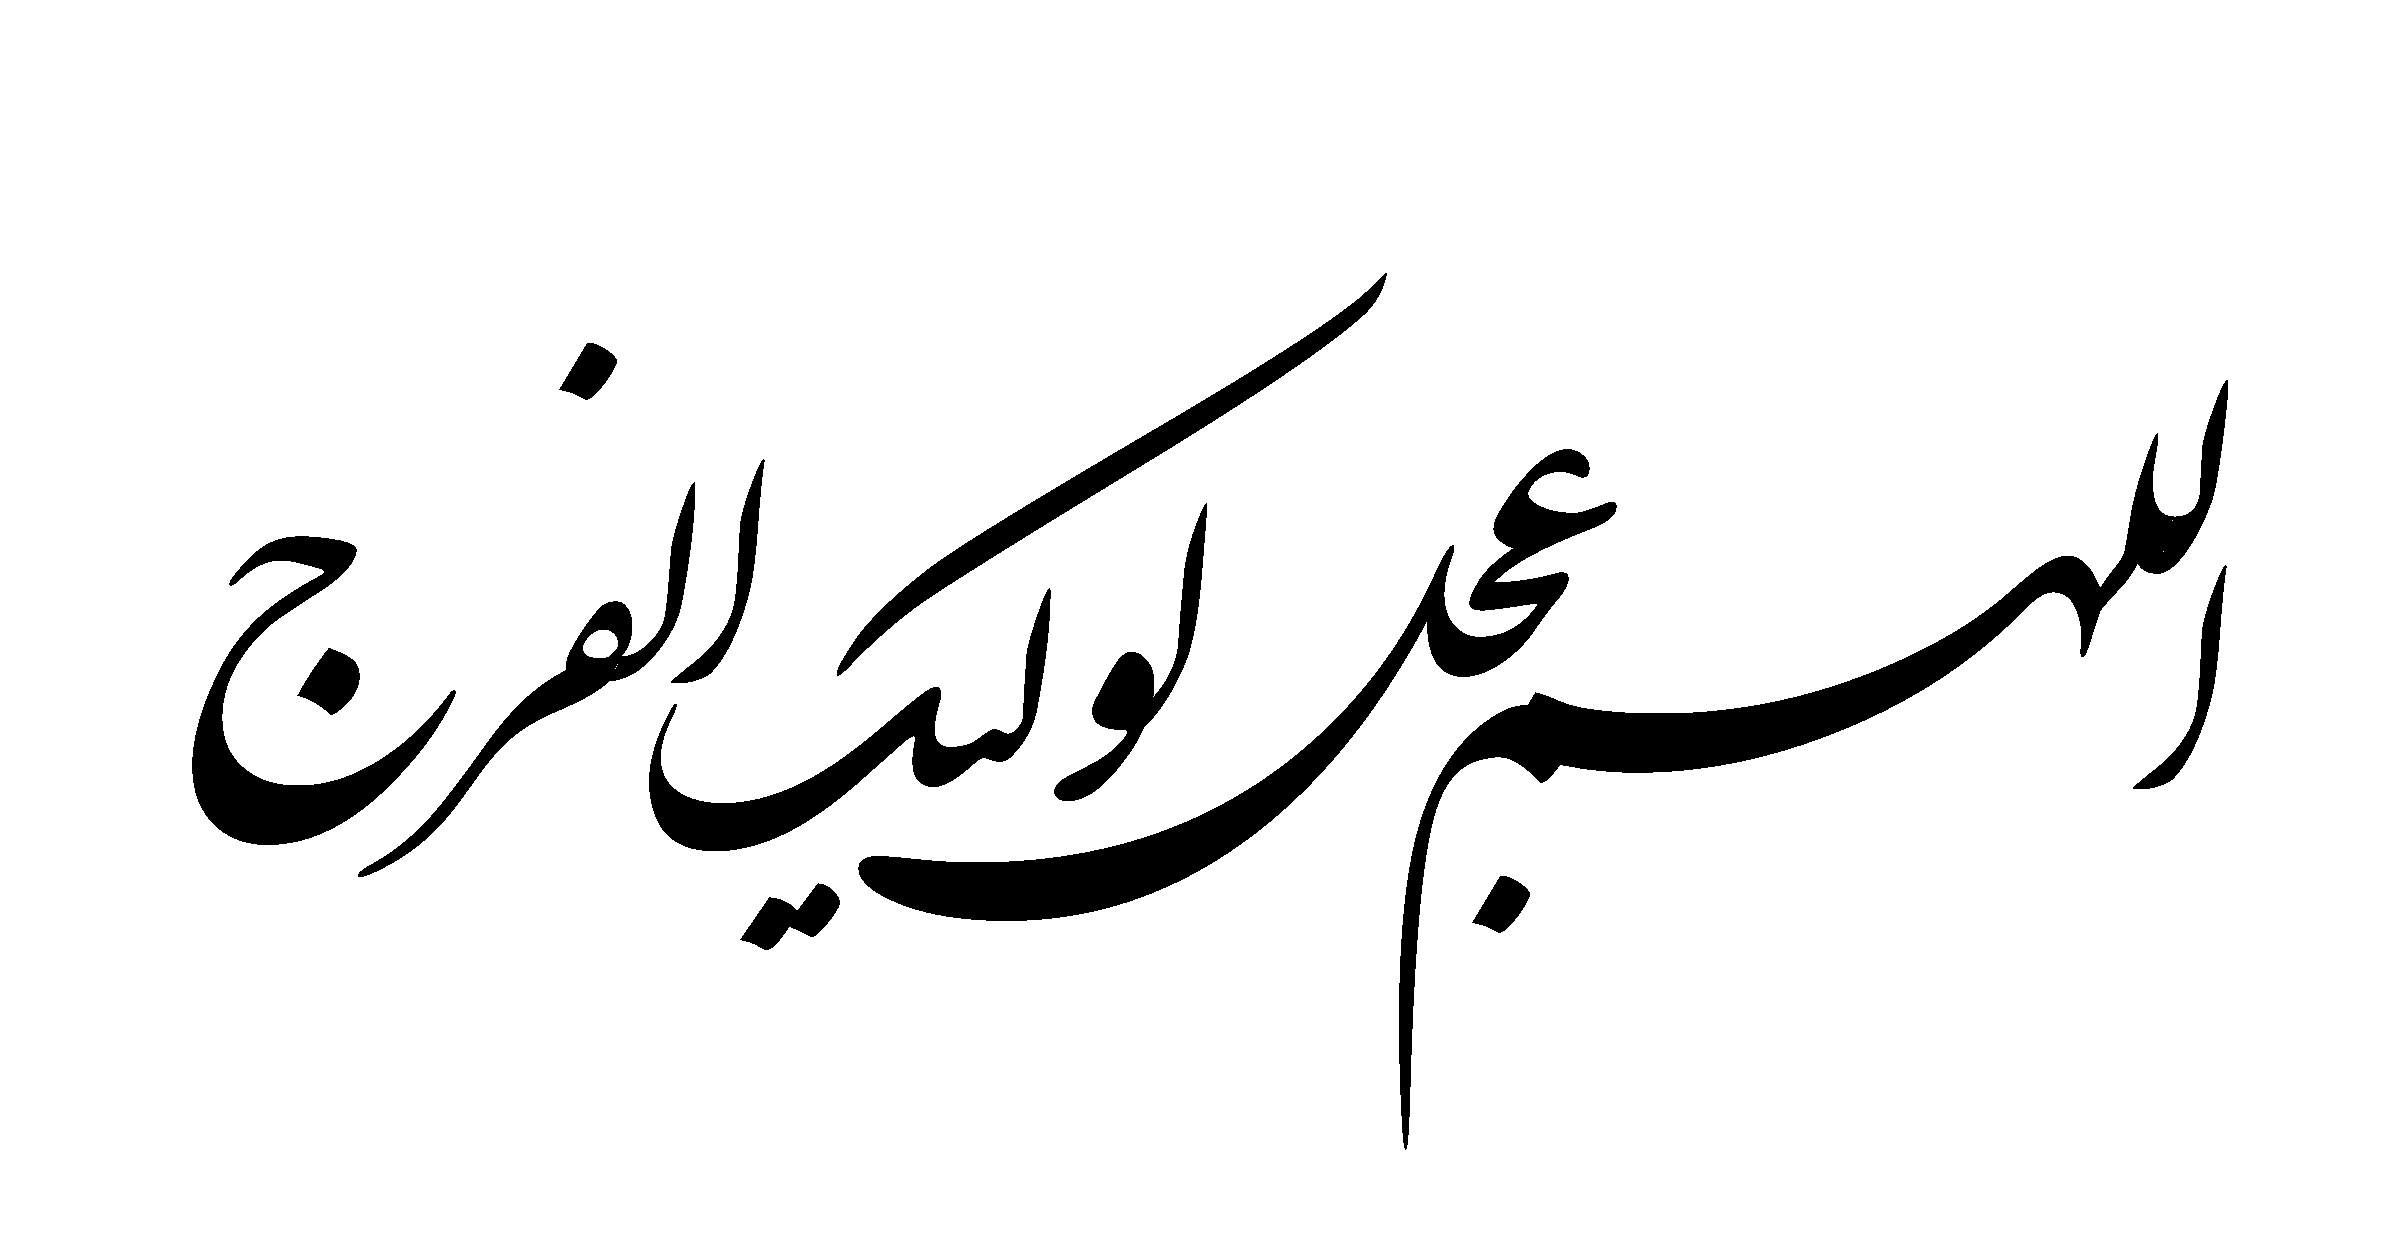 http://herfeir.persiangig.com/images/moarraq/khat/YaMahdi/MAHDI3.jpg